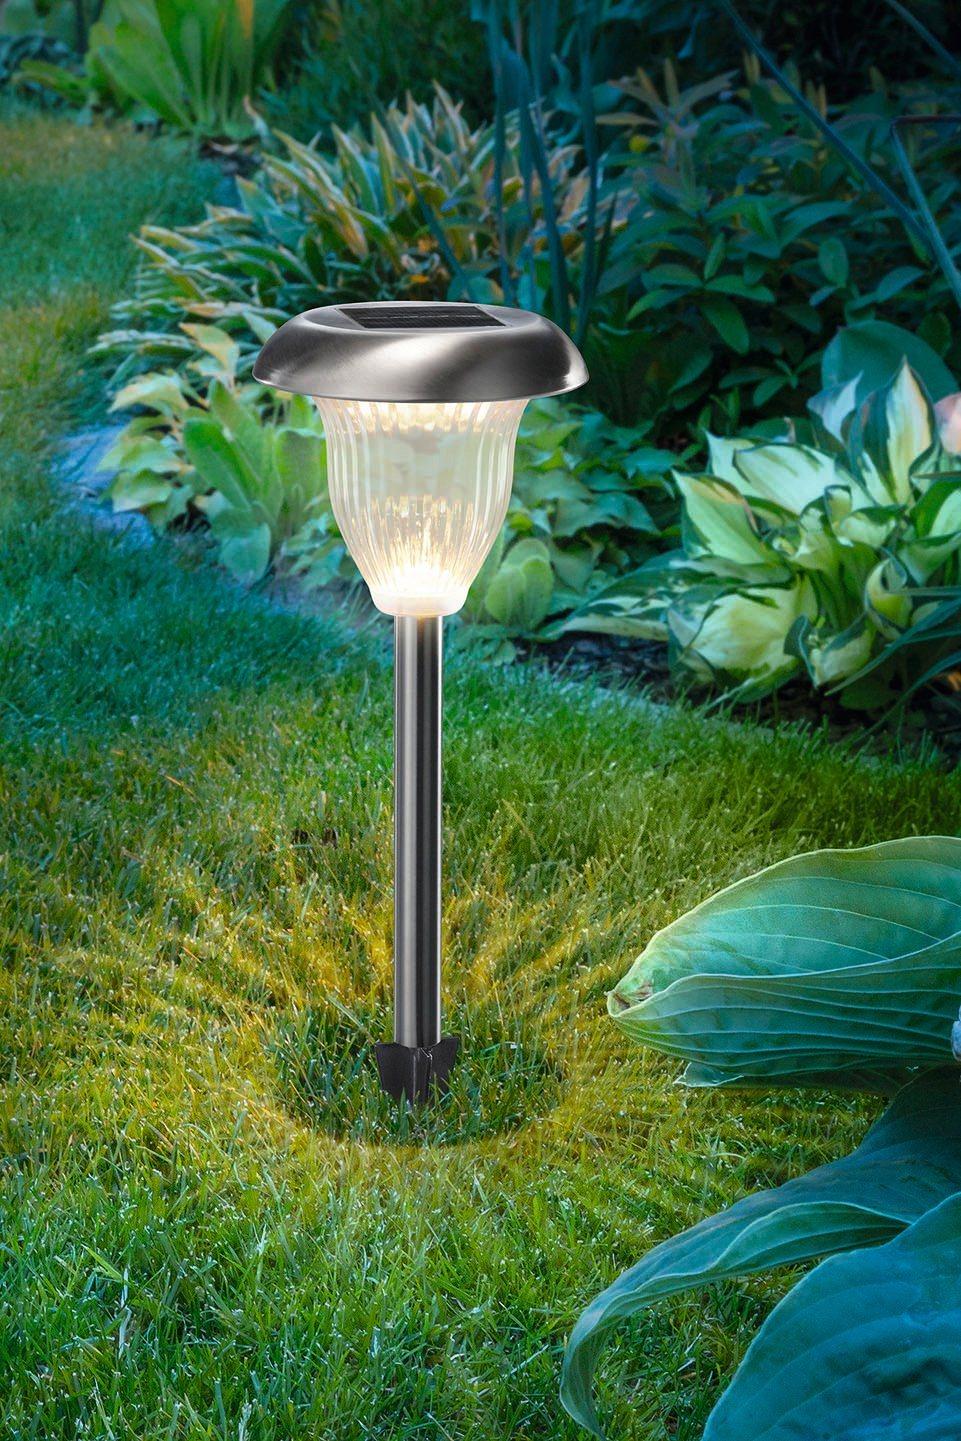 ESOTEC Solarleuchte »Flower Light«, 41 cm Höhe | Lampen > Aussenlampen > Solarleuchten | esotec